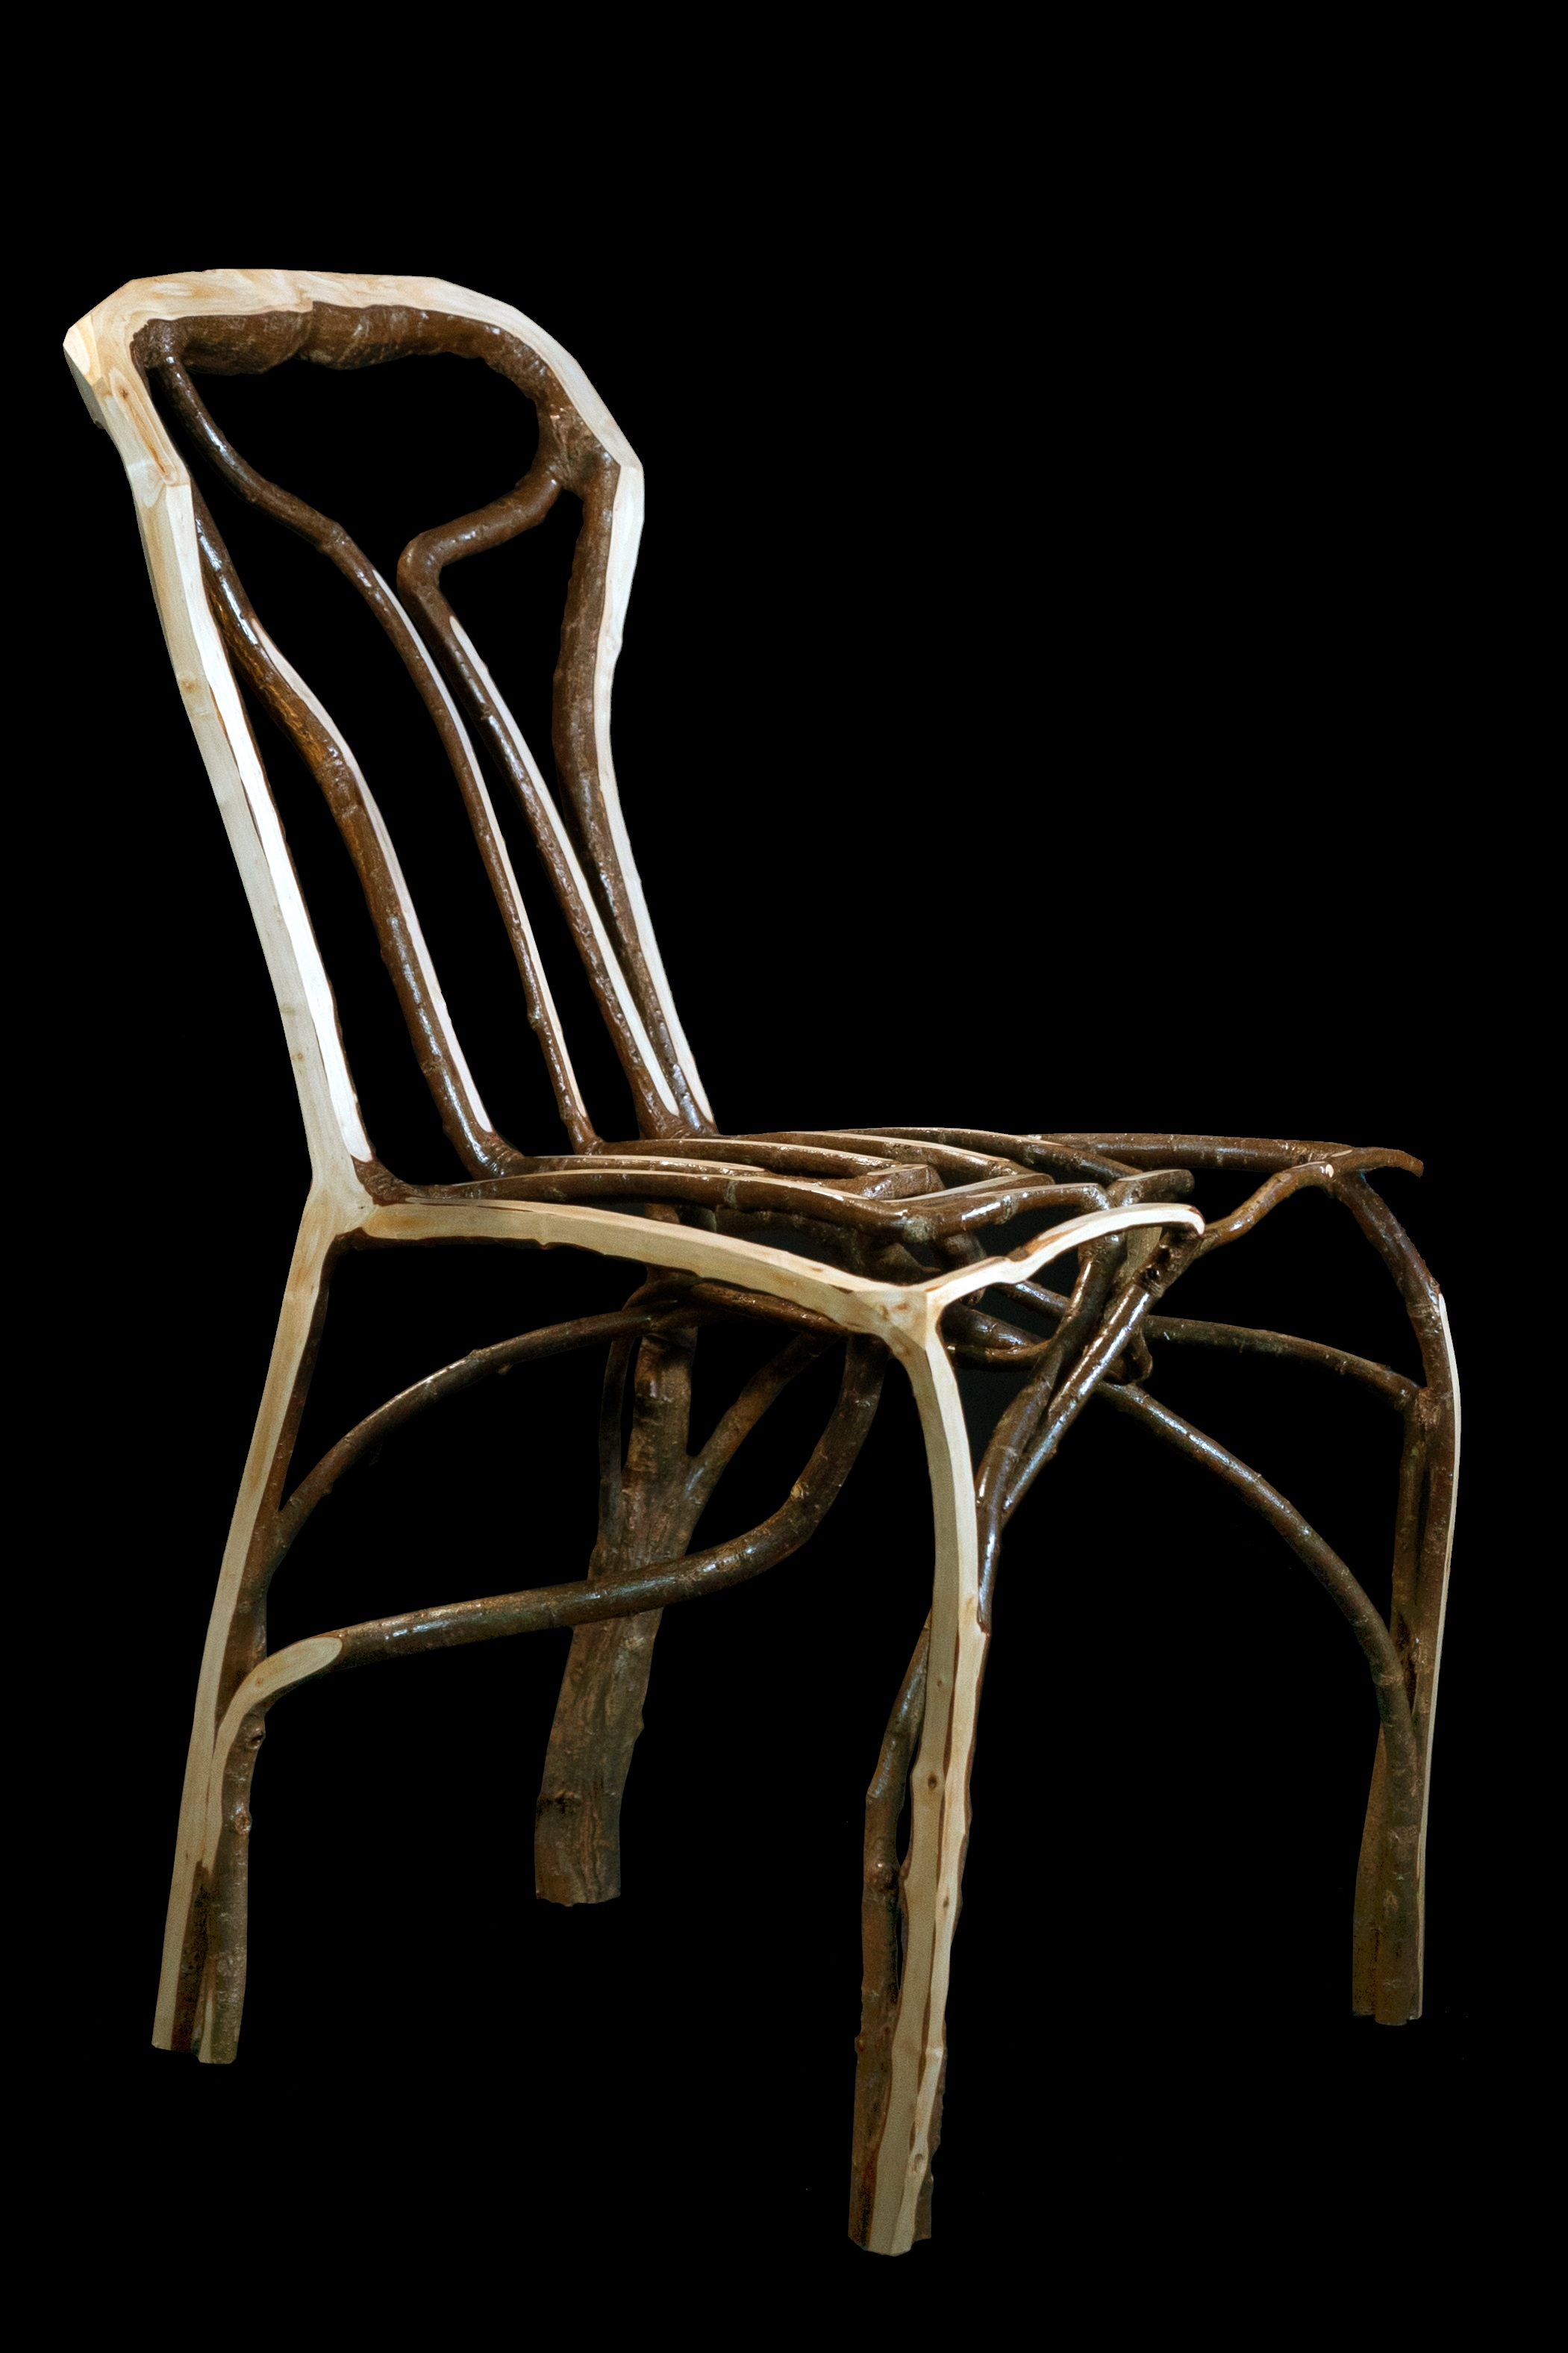 """Edwardes Chair"" by Gavin Munroe from Full Grown Ltd."